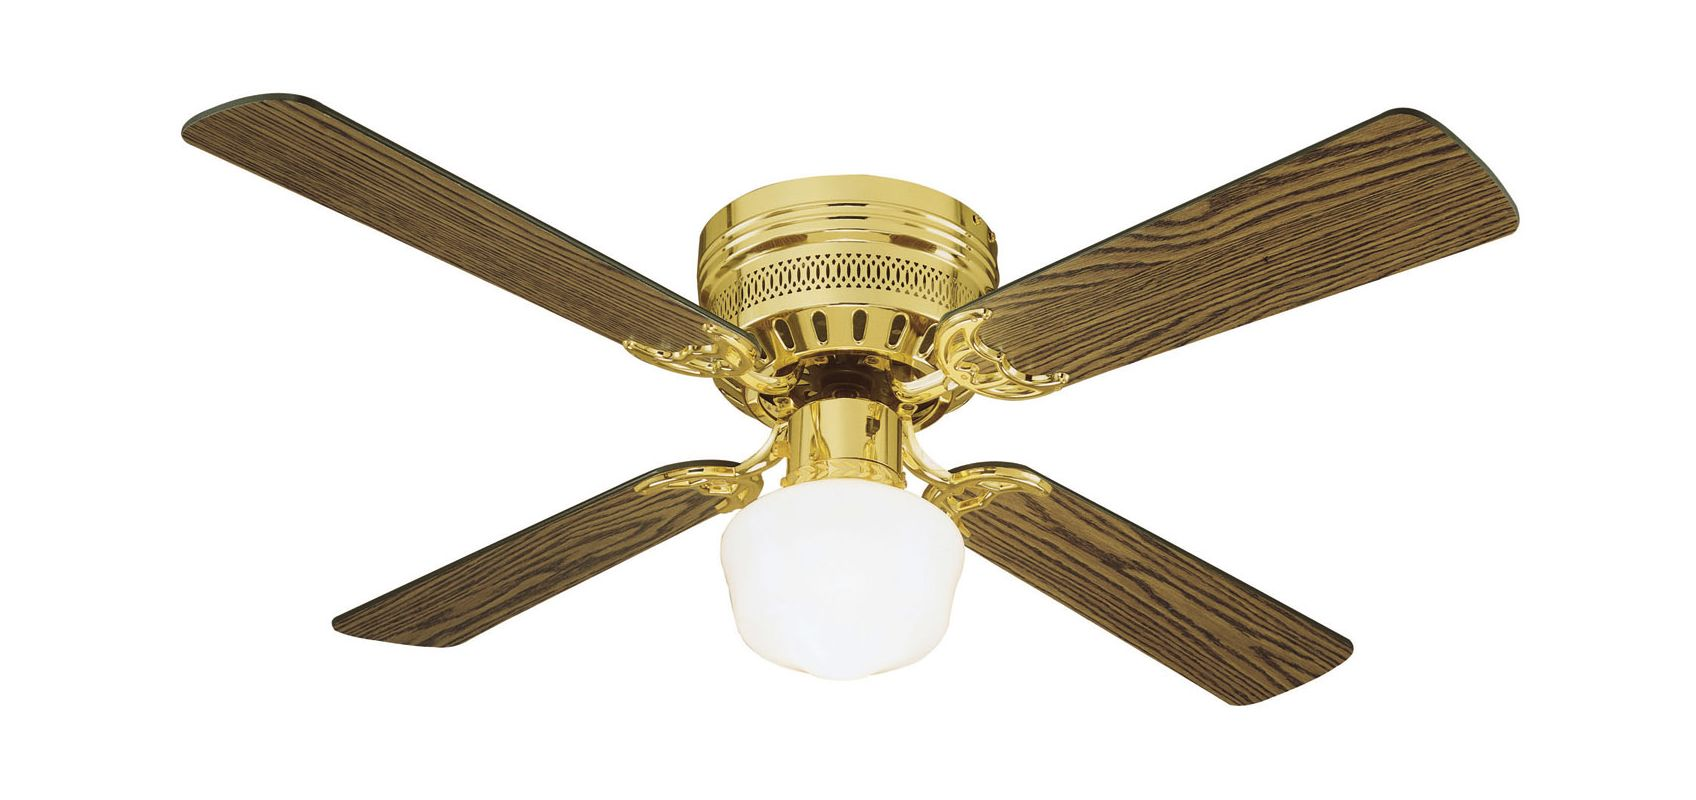 "Design House 156588 Millbridge 42 "" Hugger Ceiling Fan with Light Kit Sale $75.10 ITEM: bci1285613 ID#:156588 UPC: 44321156589 :"